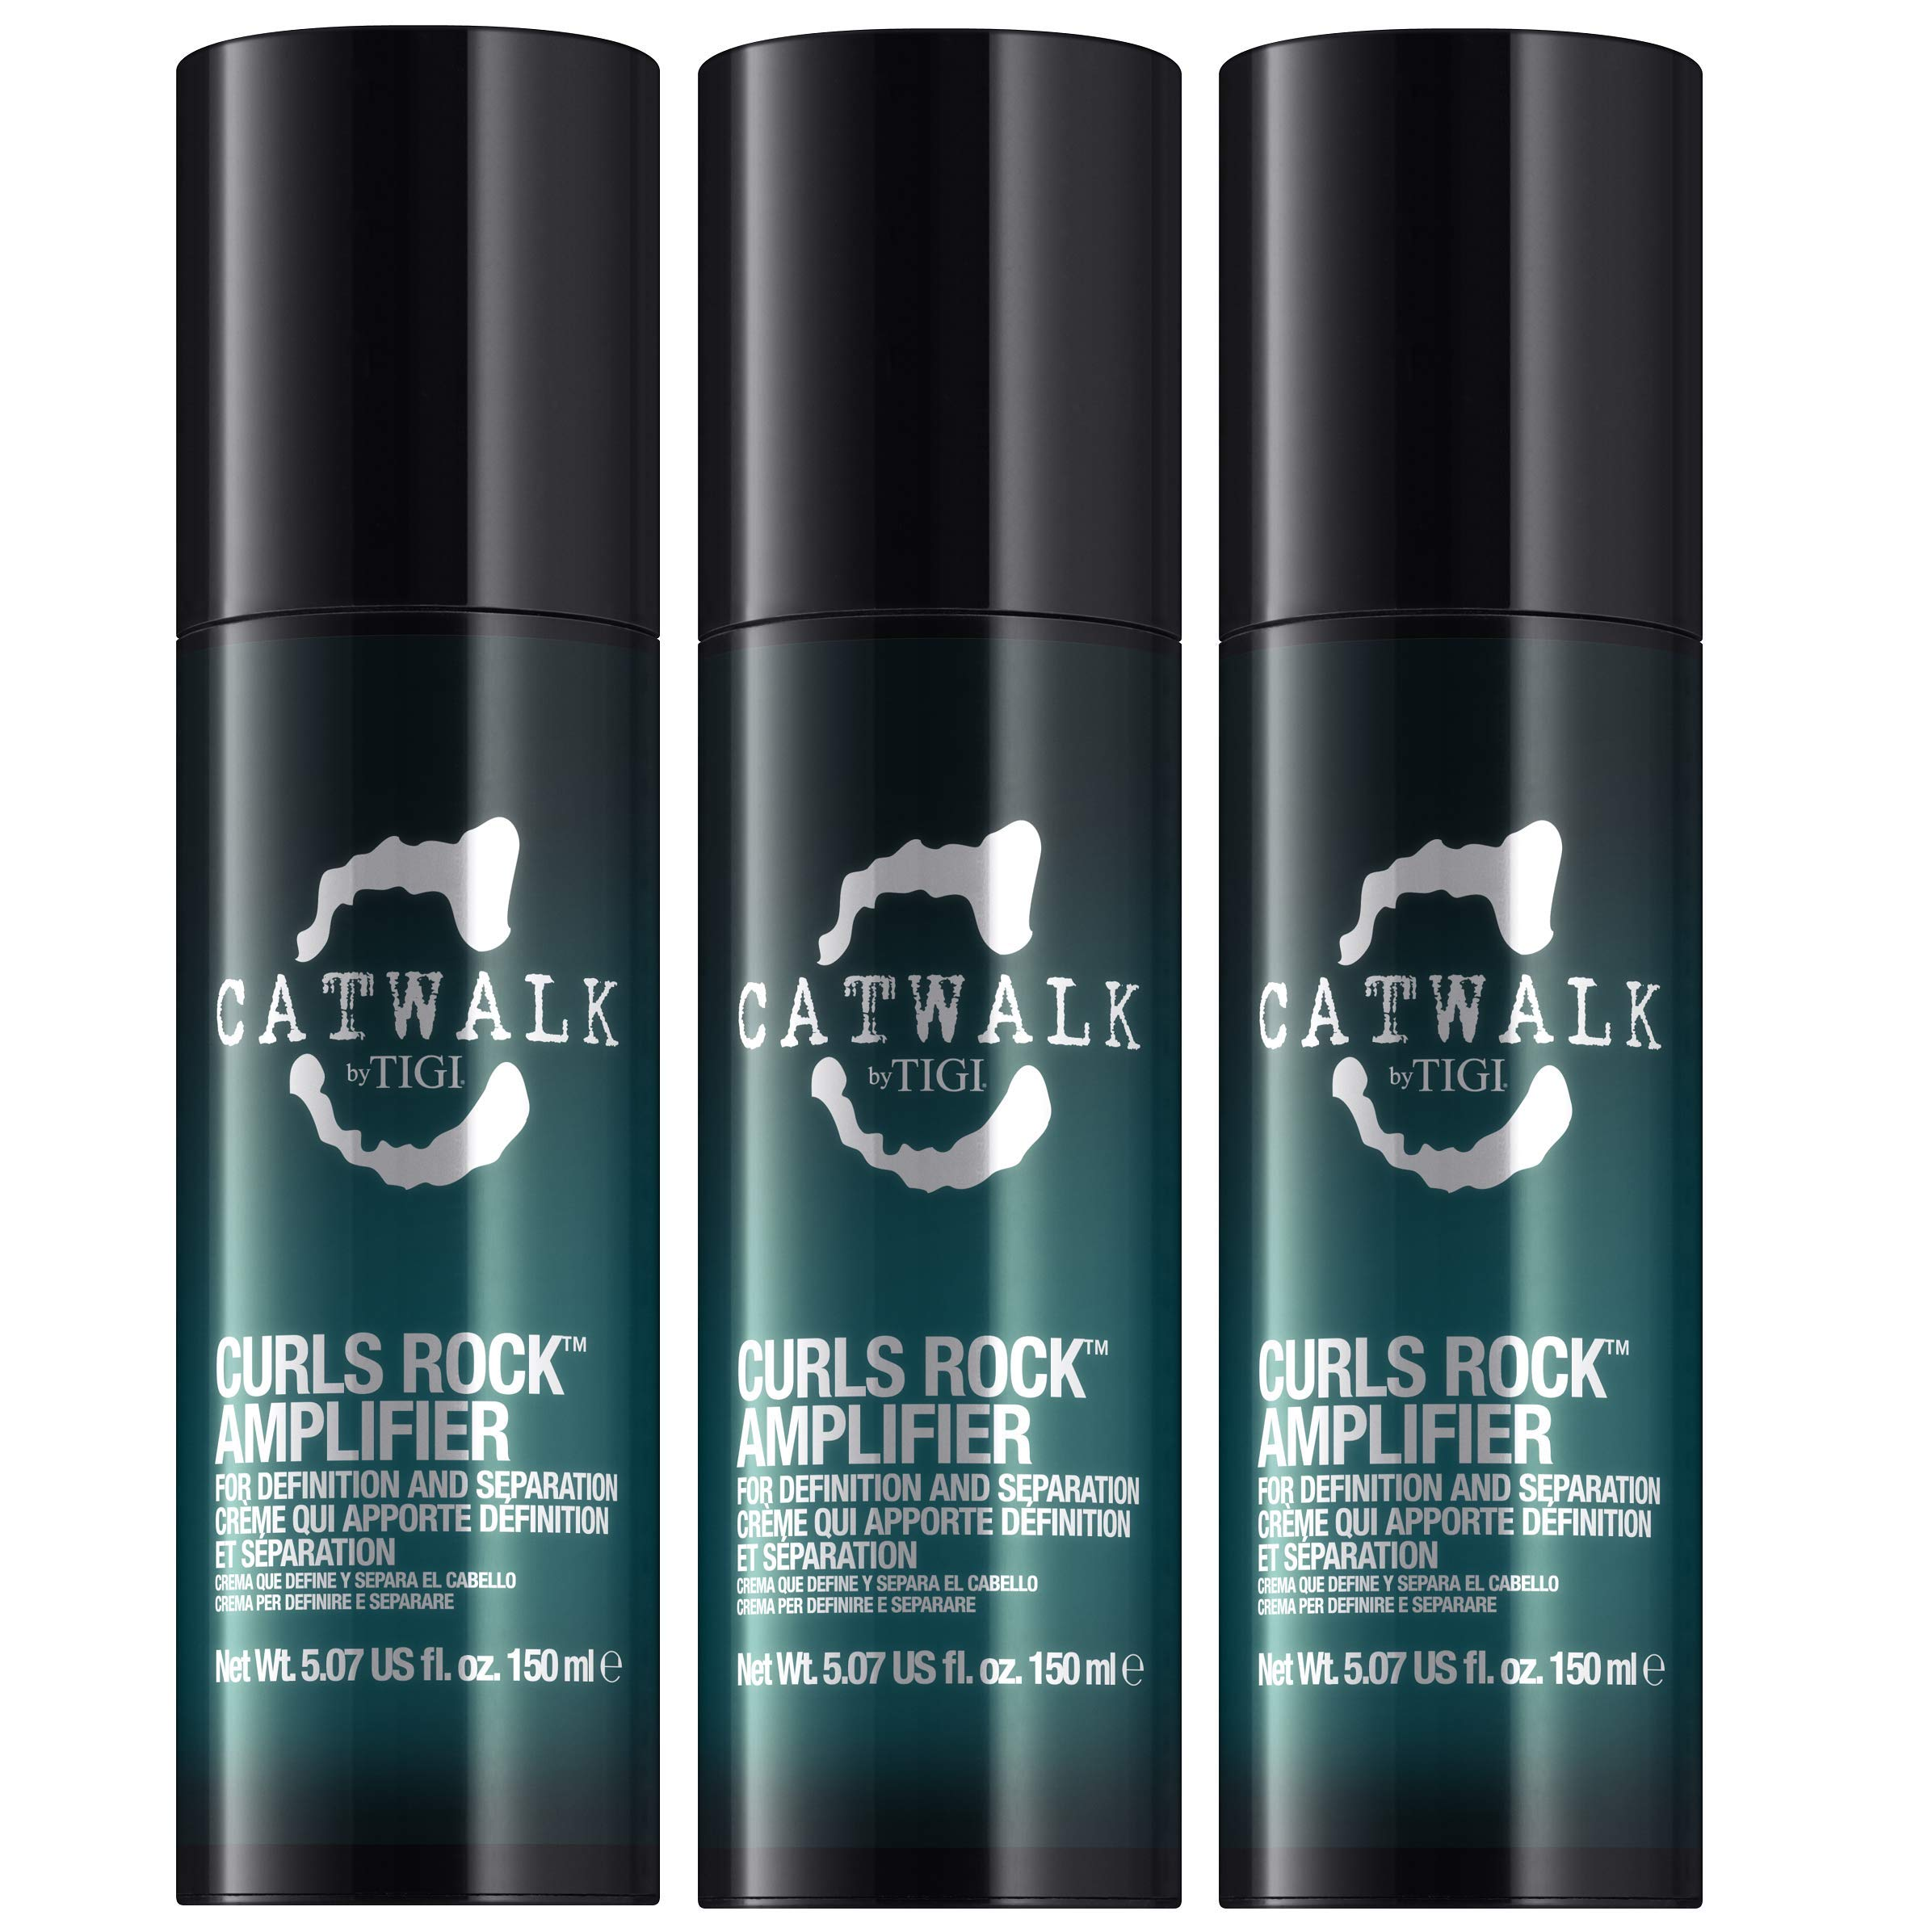 TIGI Catwalk Curls Rock Amplifier Curly Hair Cream 150 ml Pack of 3